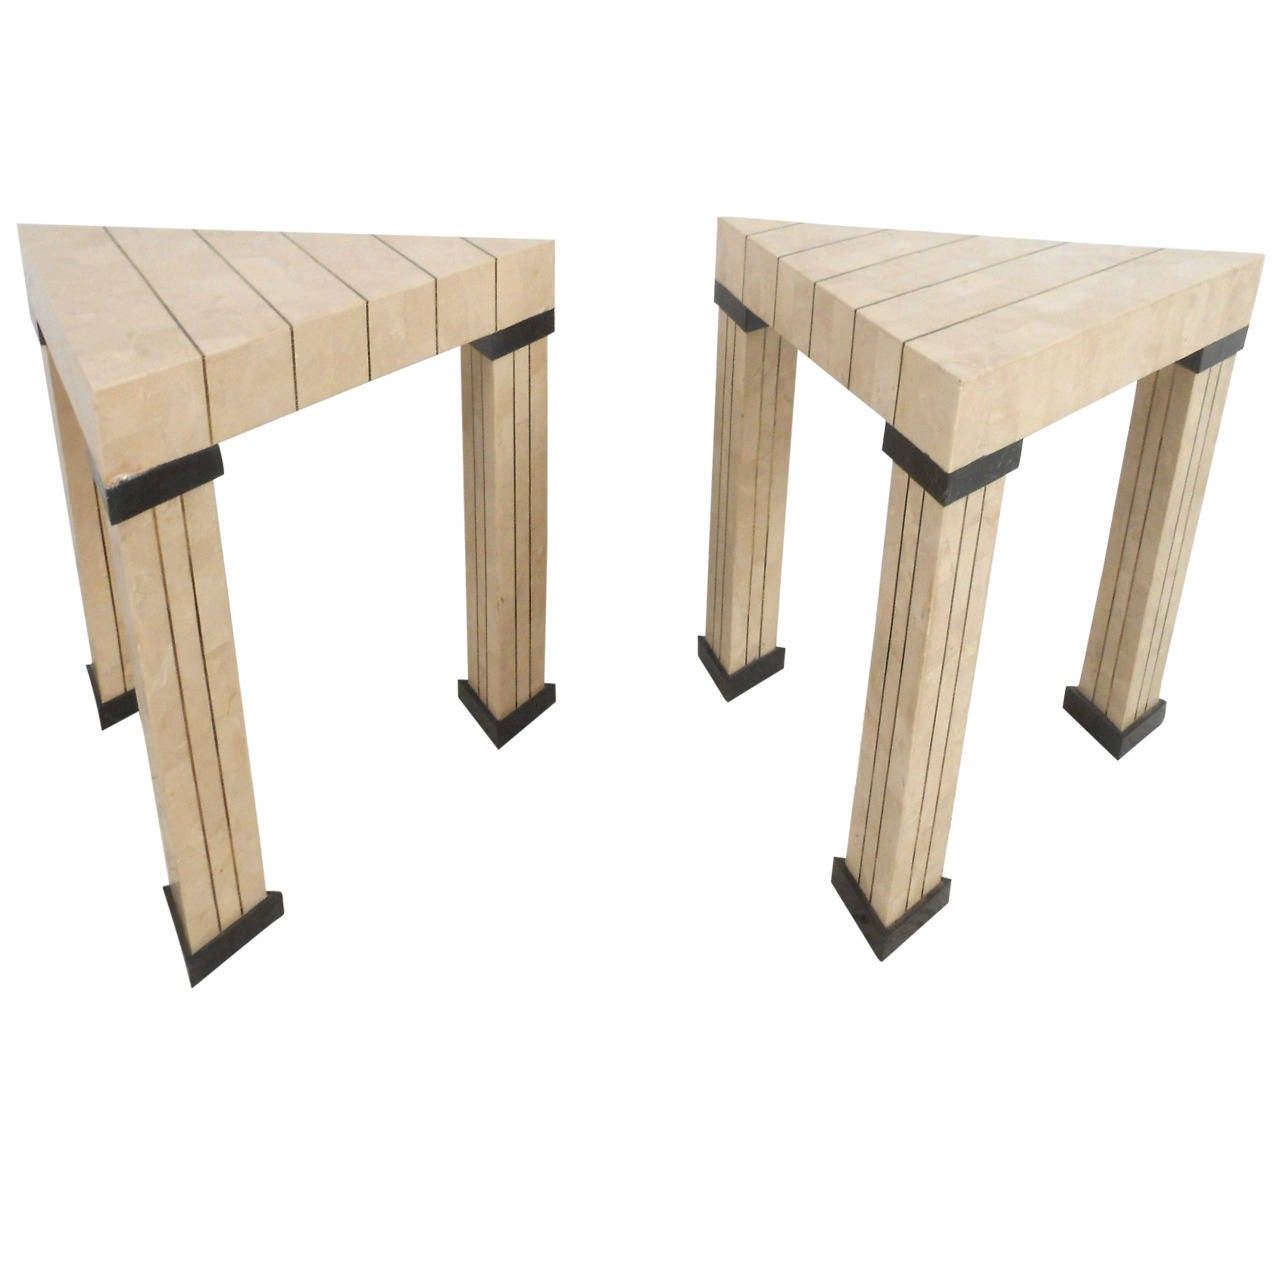 Pair of Mid-Century Modern Maitland Smith Style Triangular End Tables